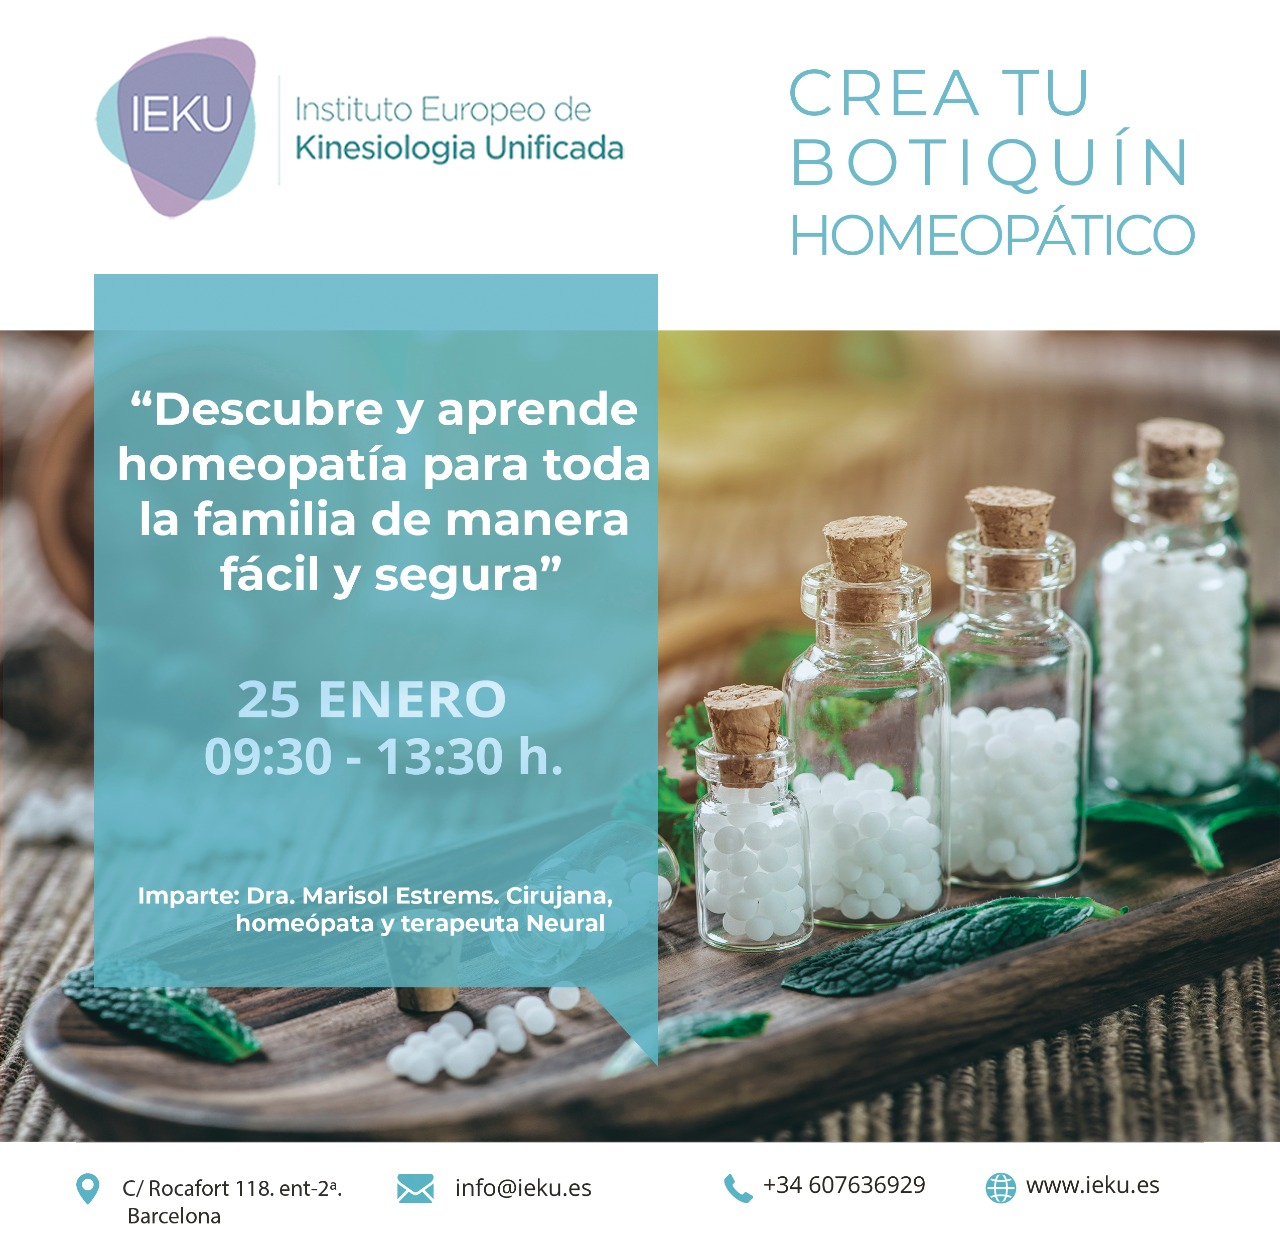 Crea tu botiquín homeopático